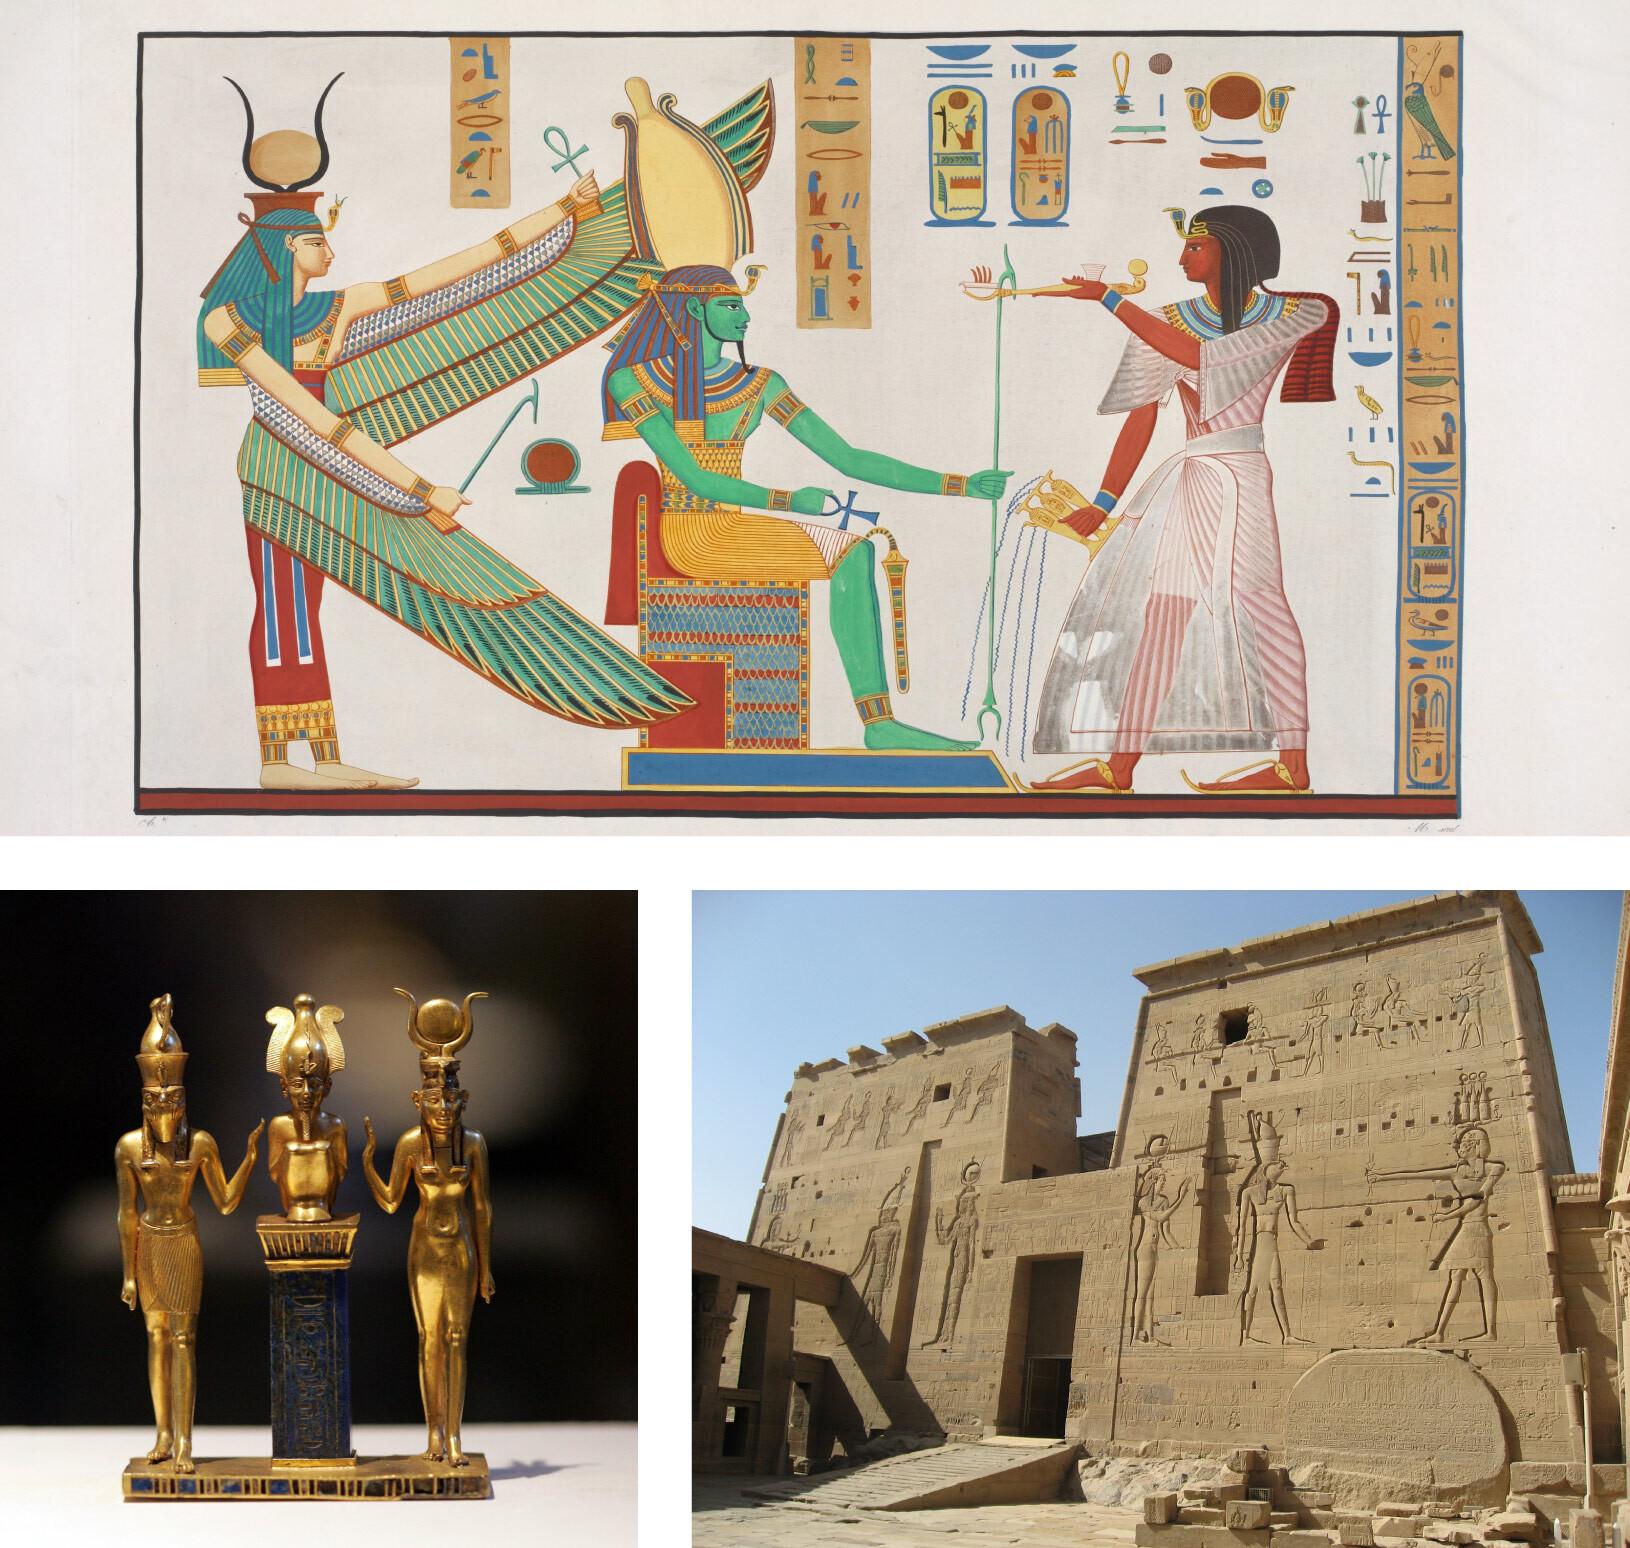 N001-501-ISIS-E-OSIRIS-SITE-MEMORY